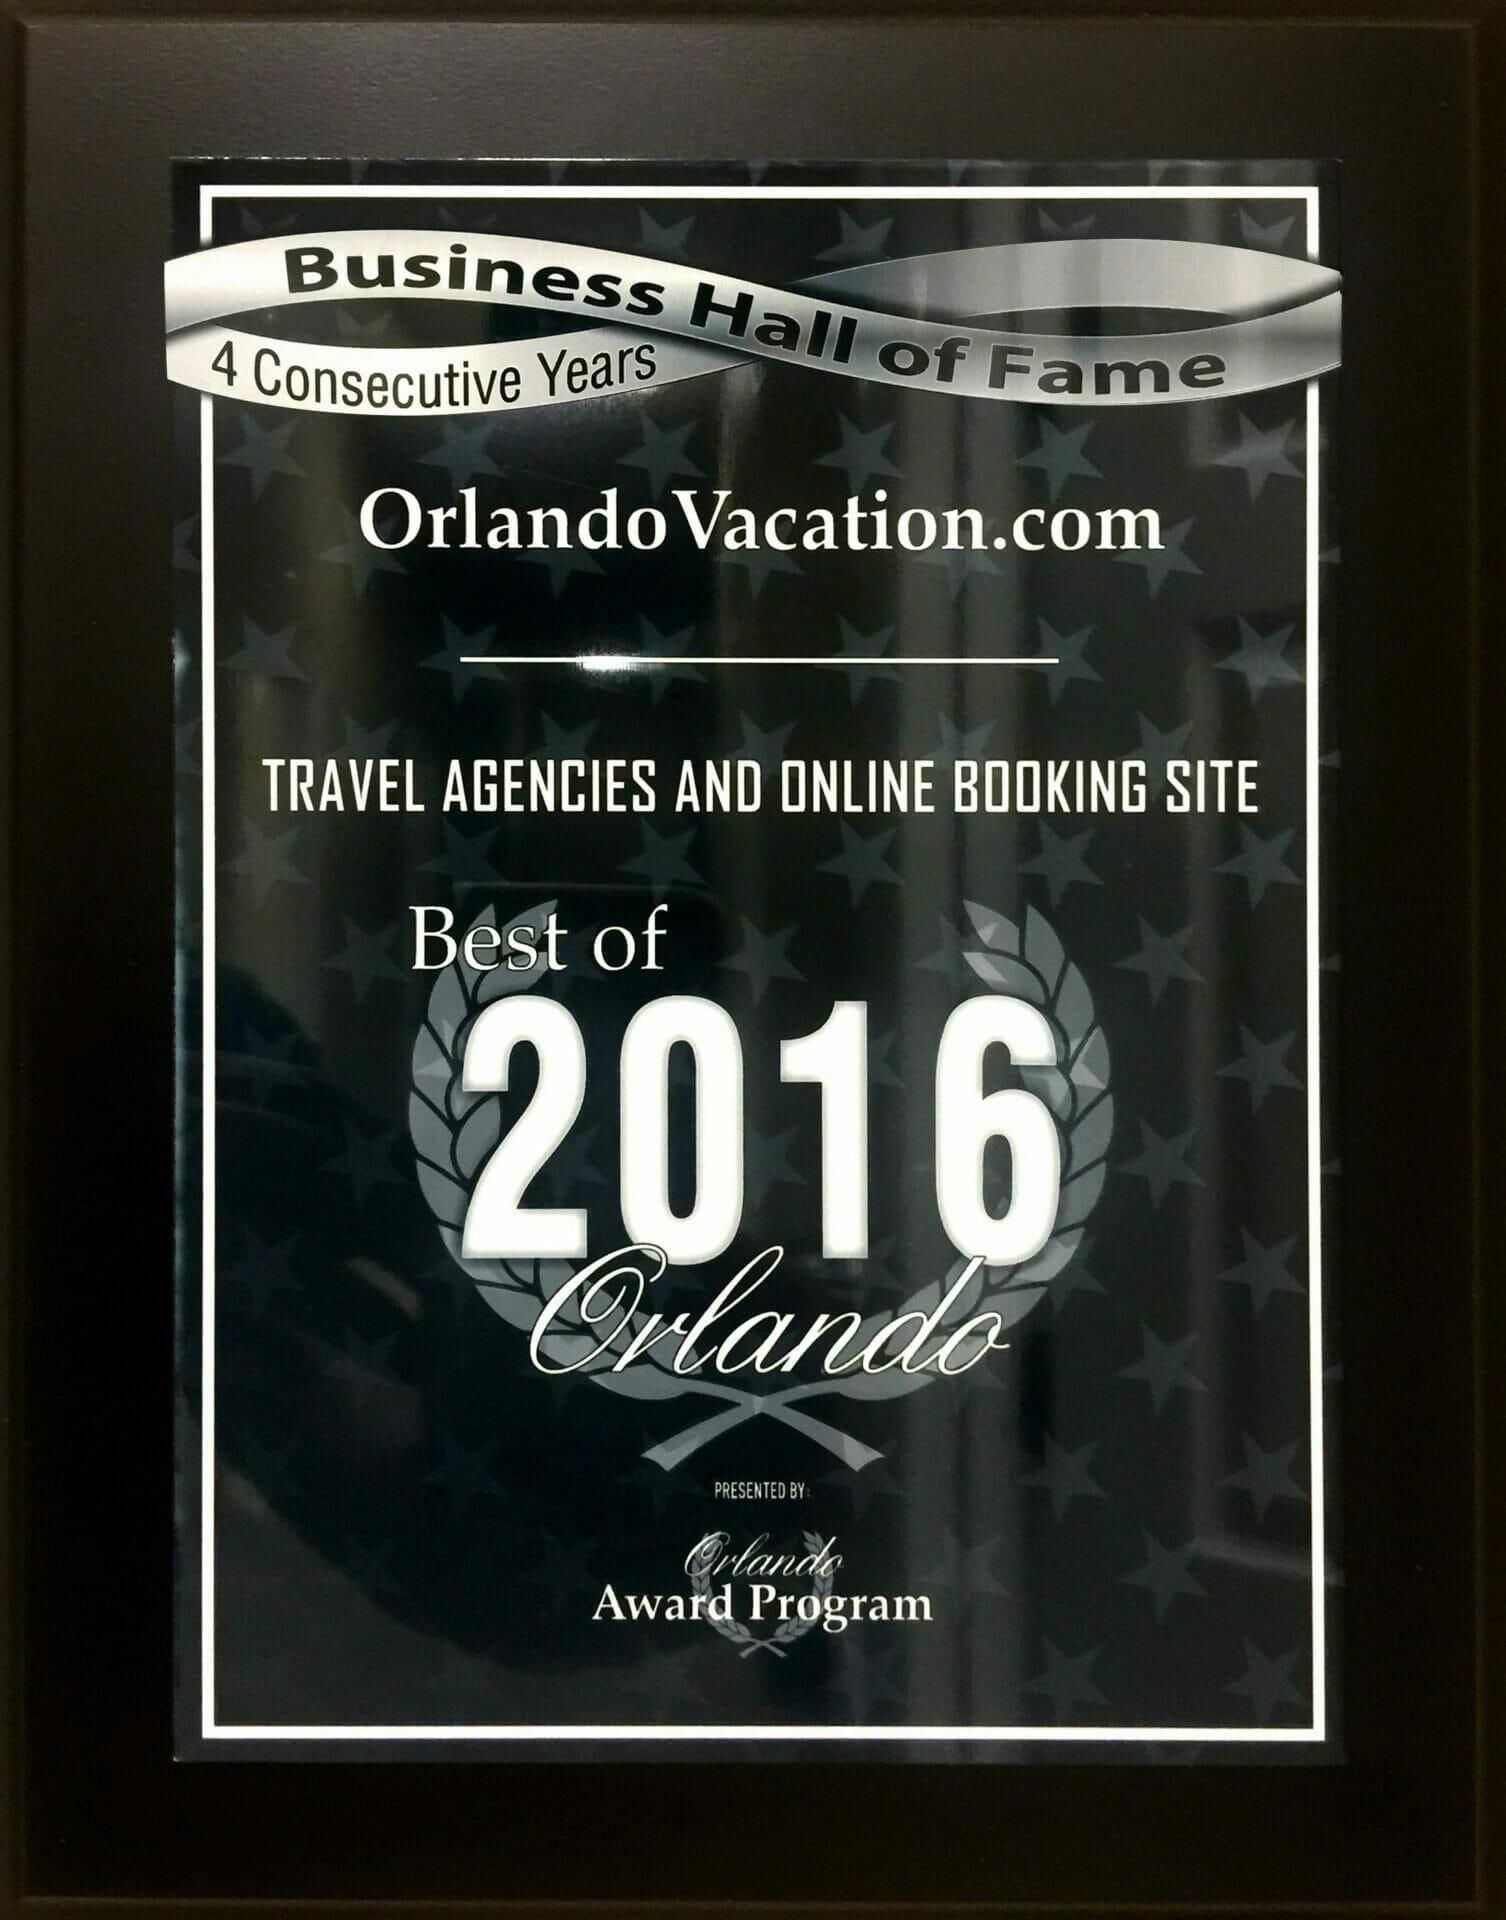 Orlando Vacation Award 2016